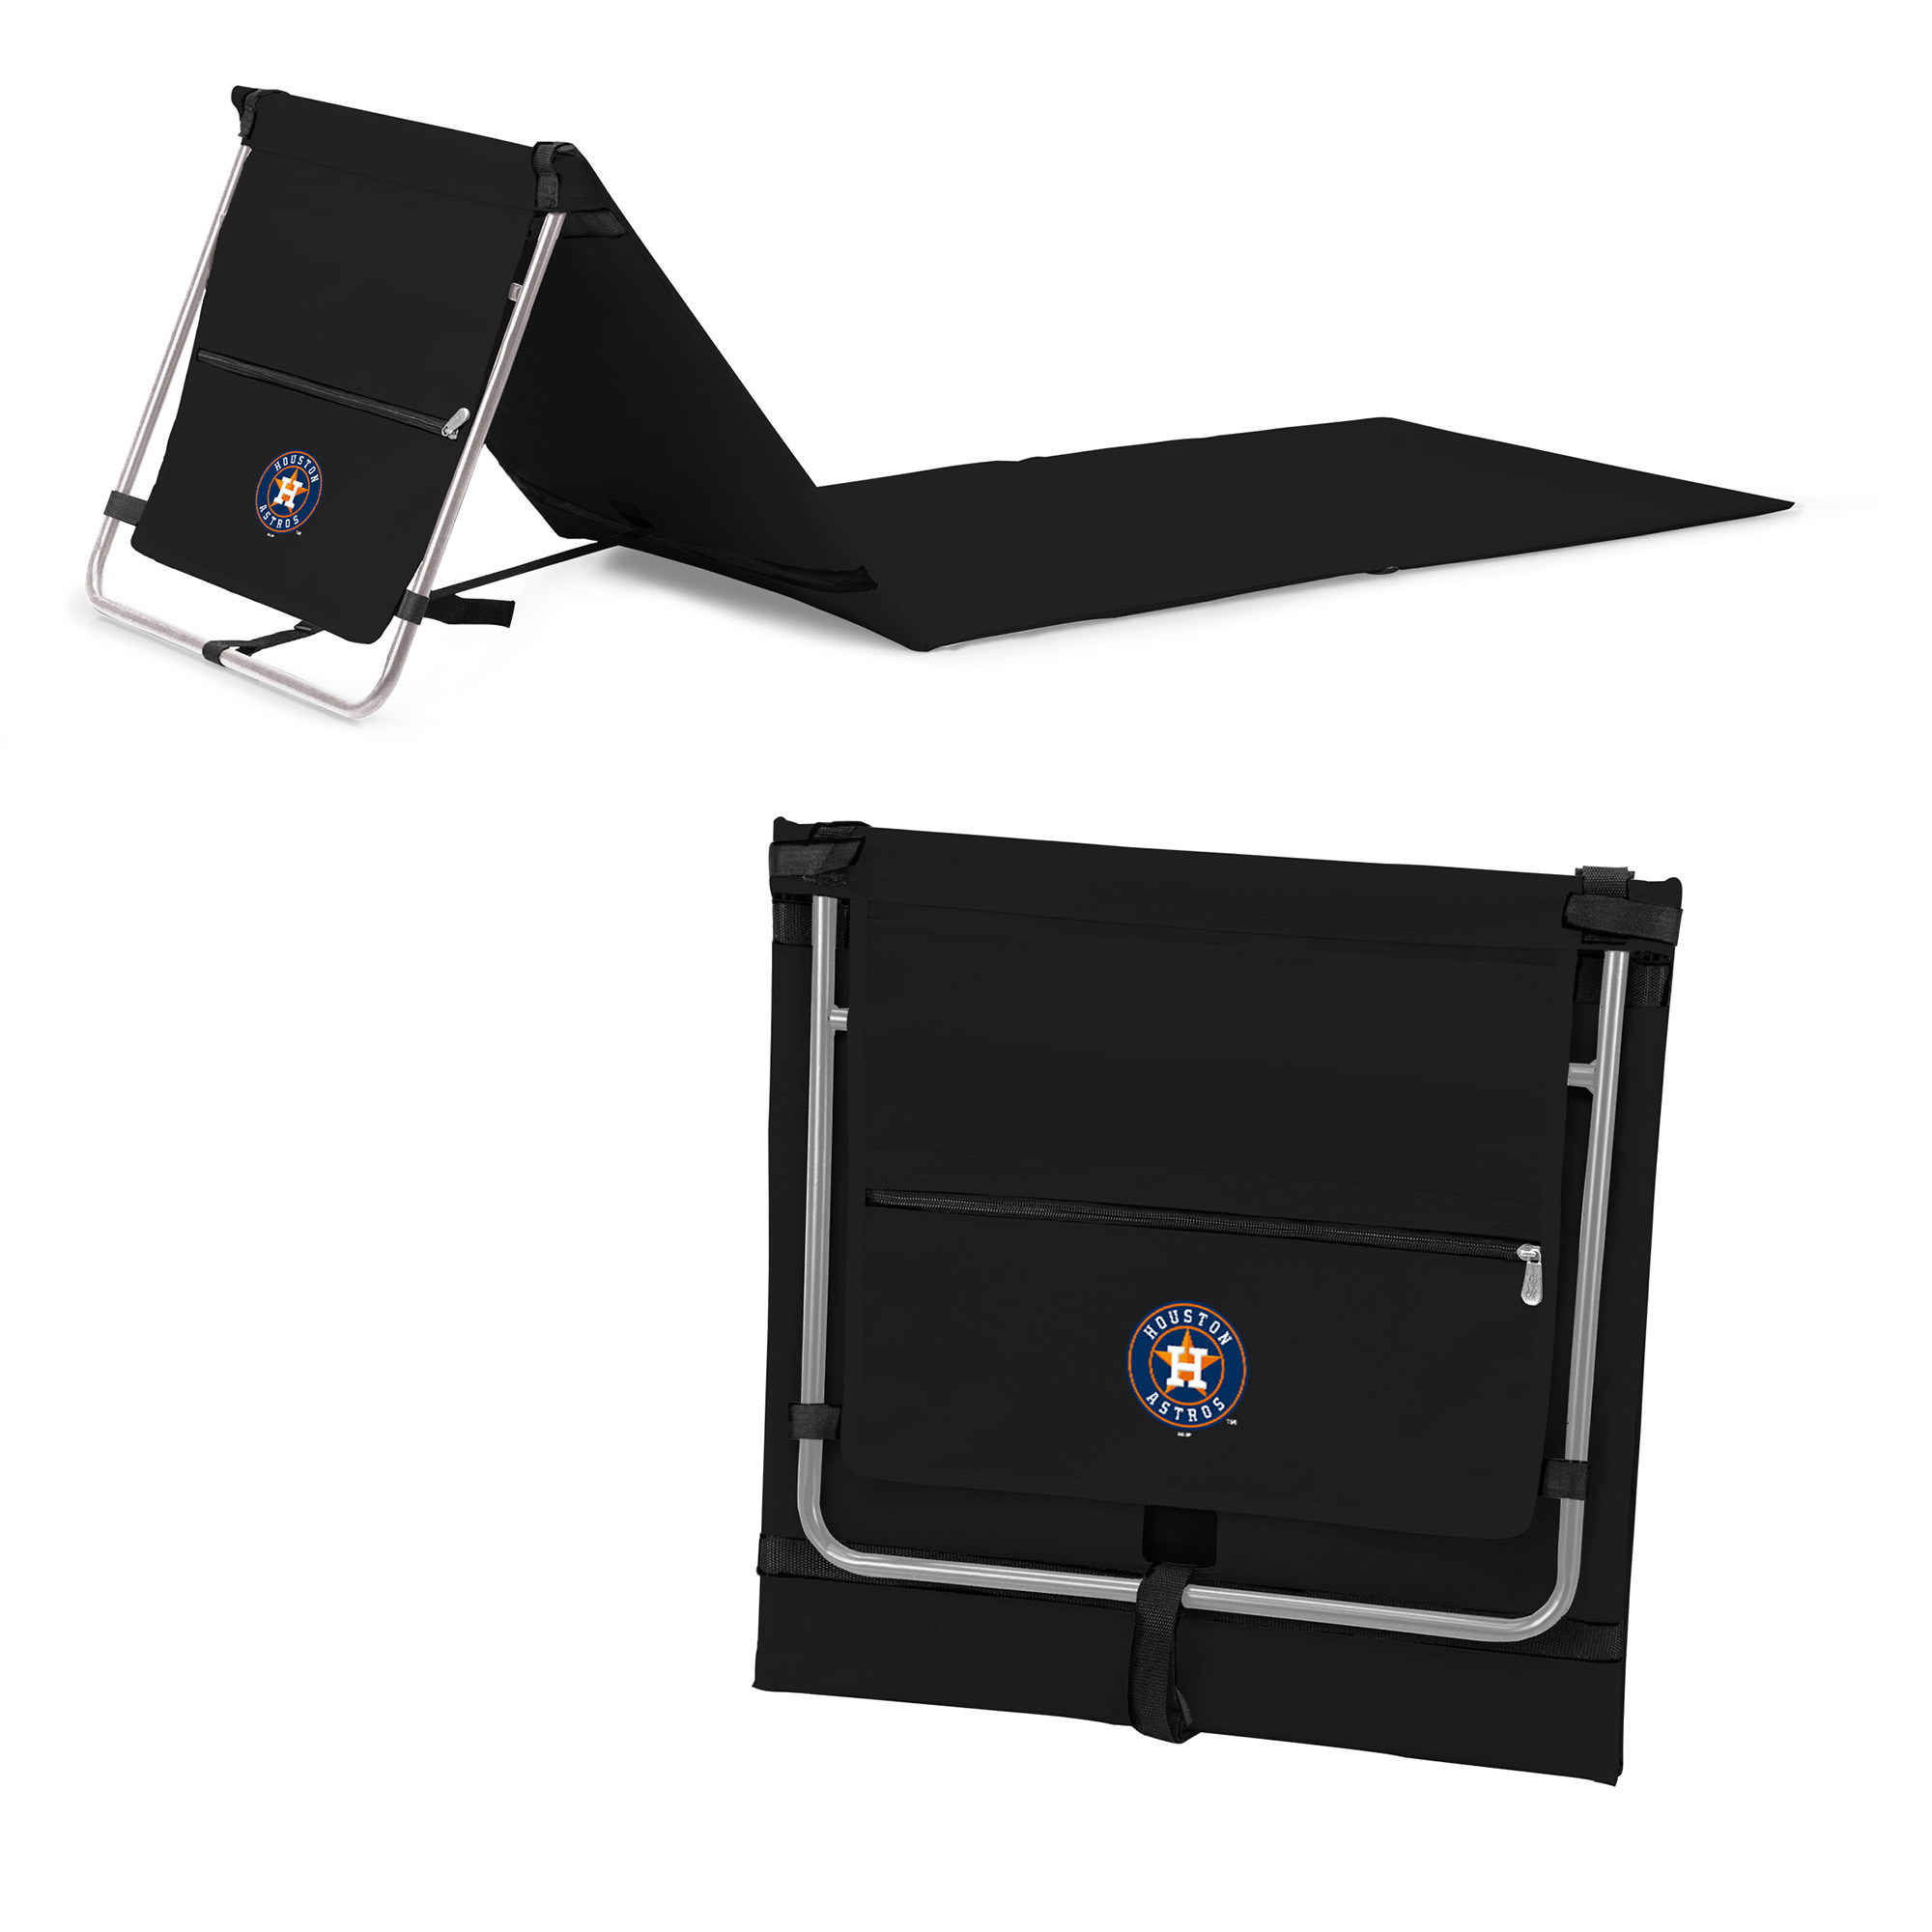 Houston Astros Portable Lounger Beach Mat - Black - No Size